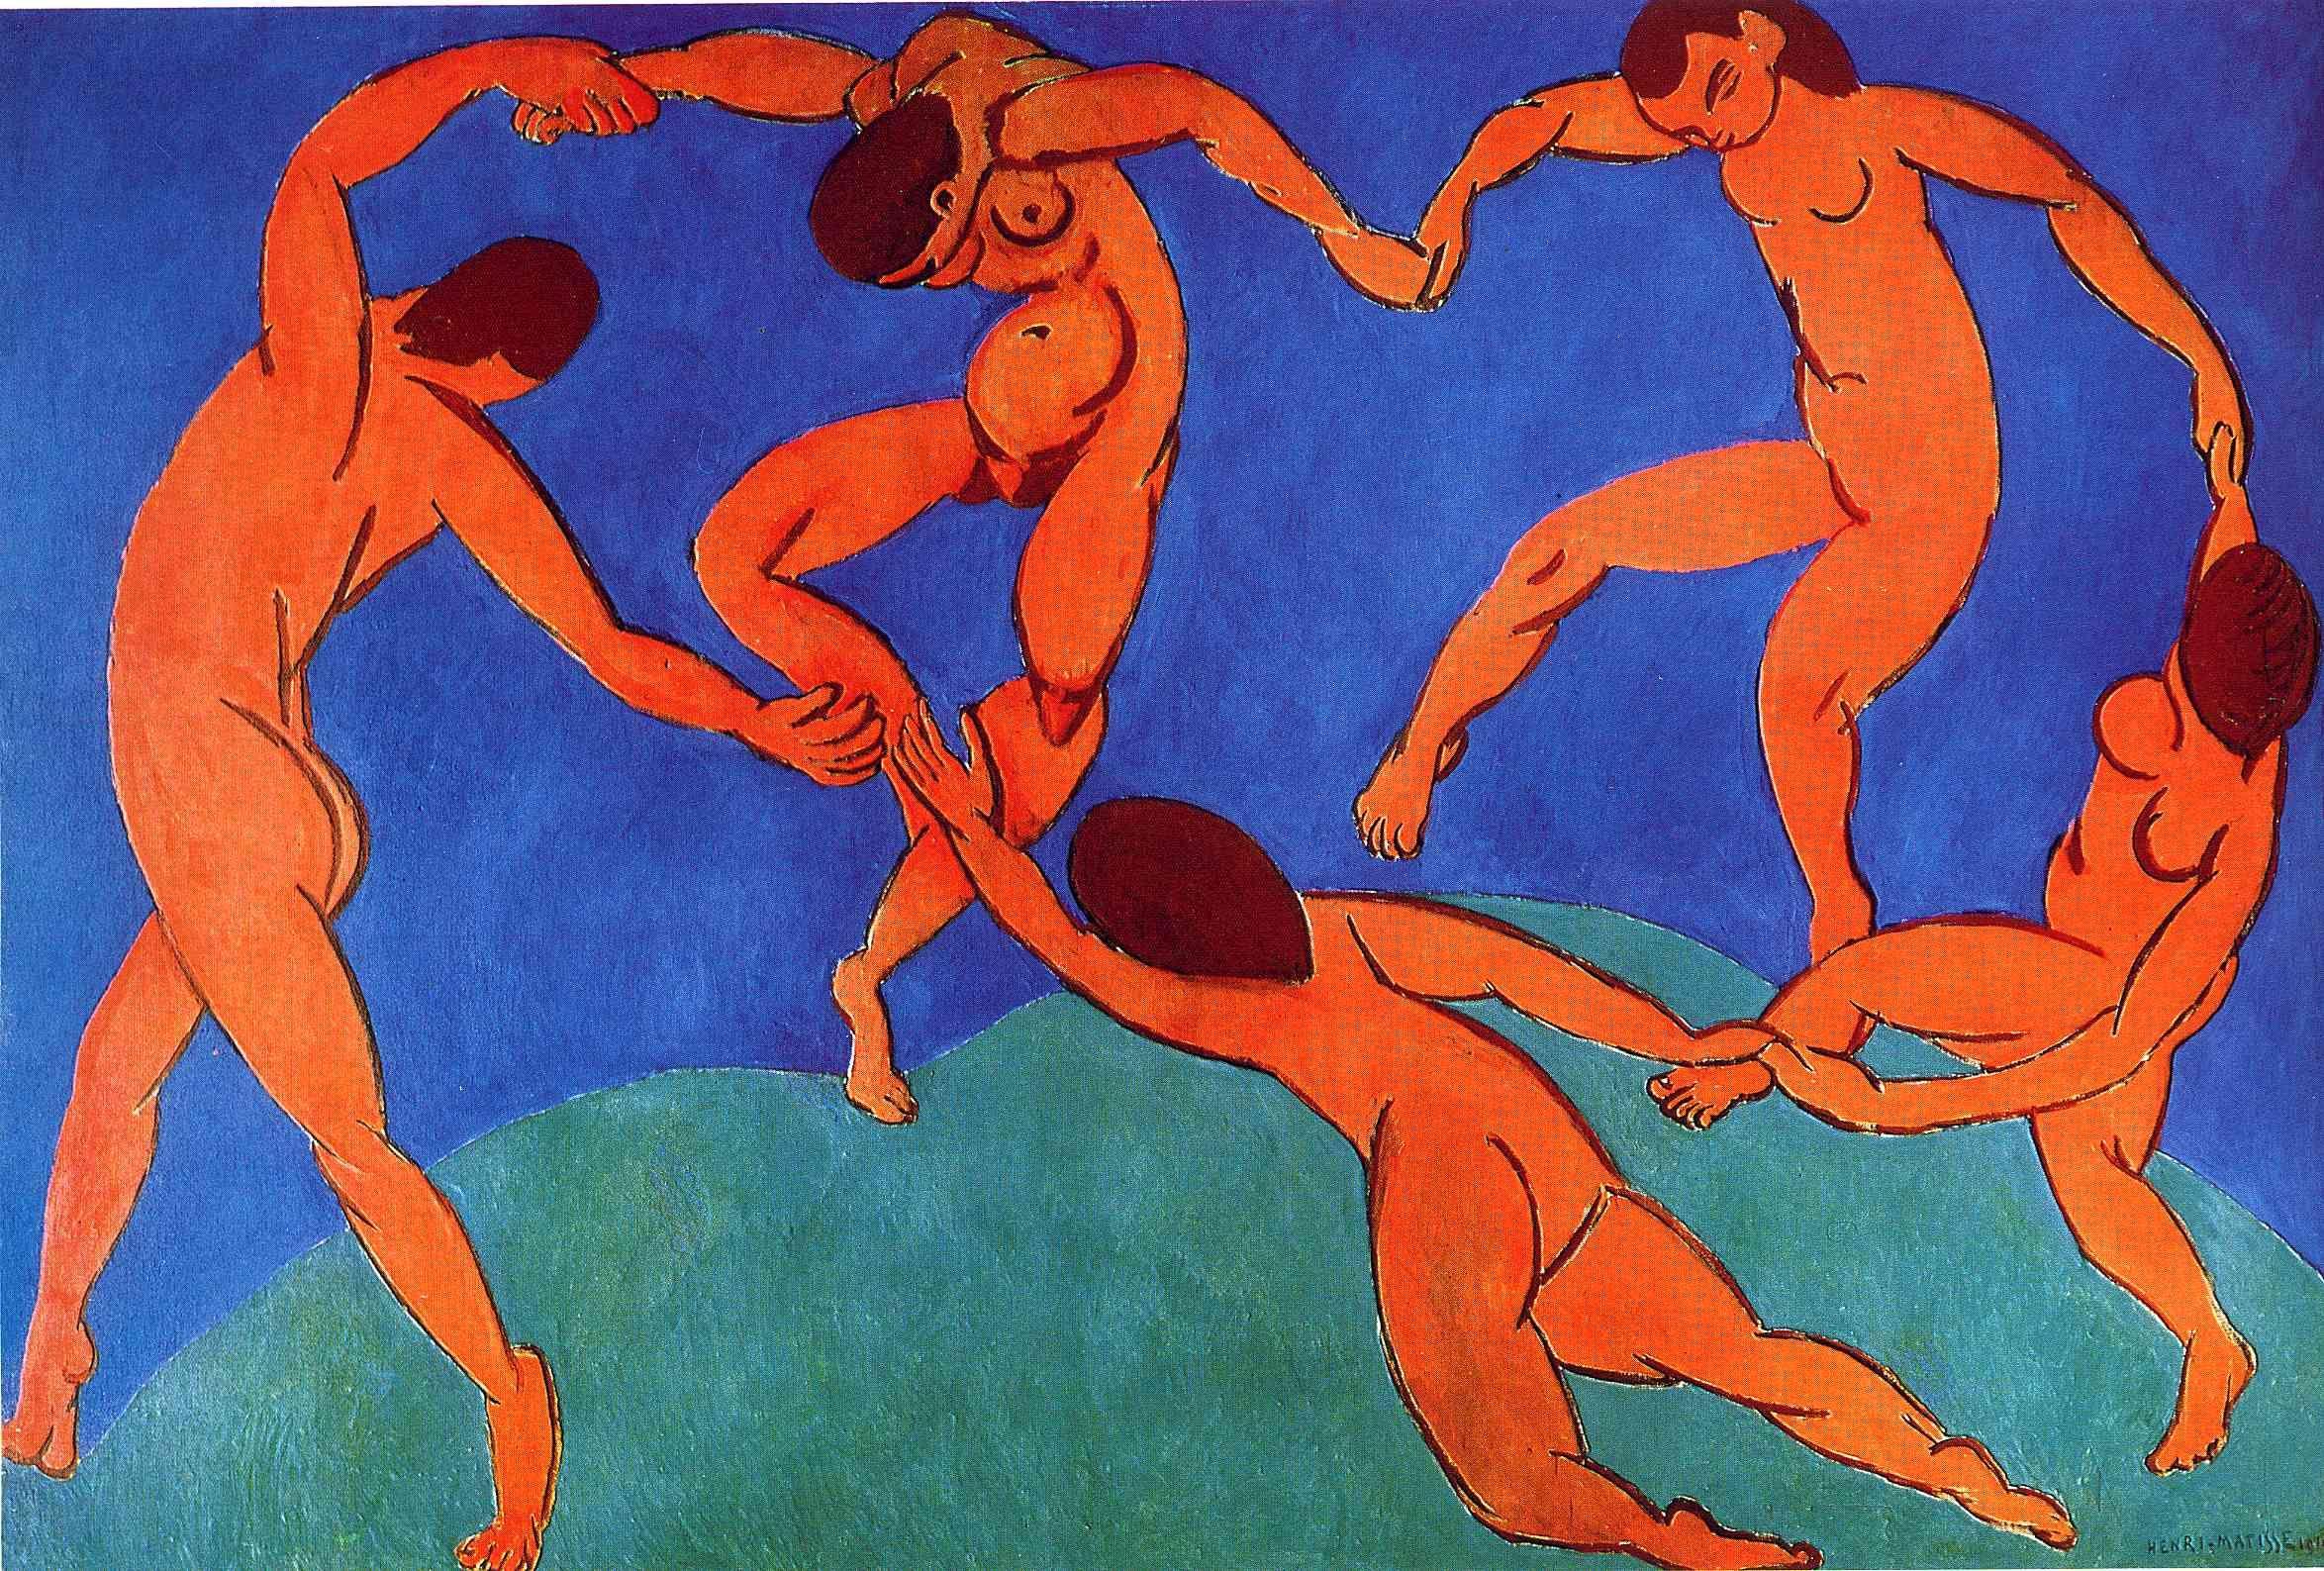 Henri Matisse - Dance II 1910